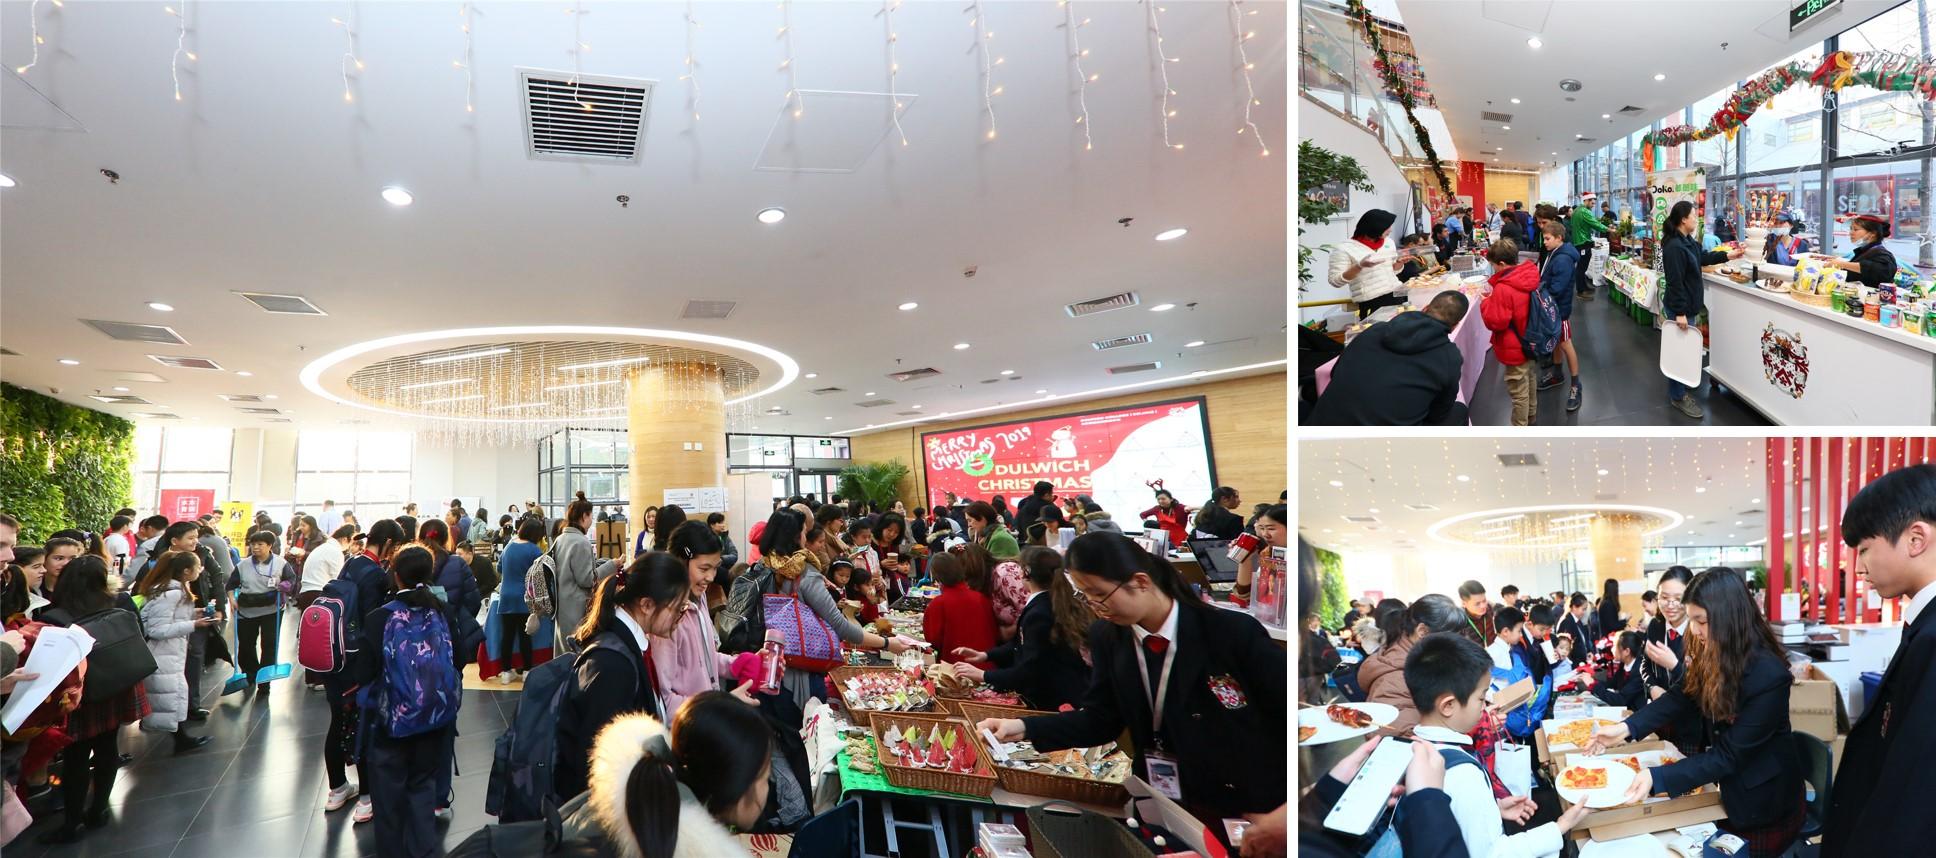 dulwich-christmas-bazzar-2-北京德威英国国际学校